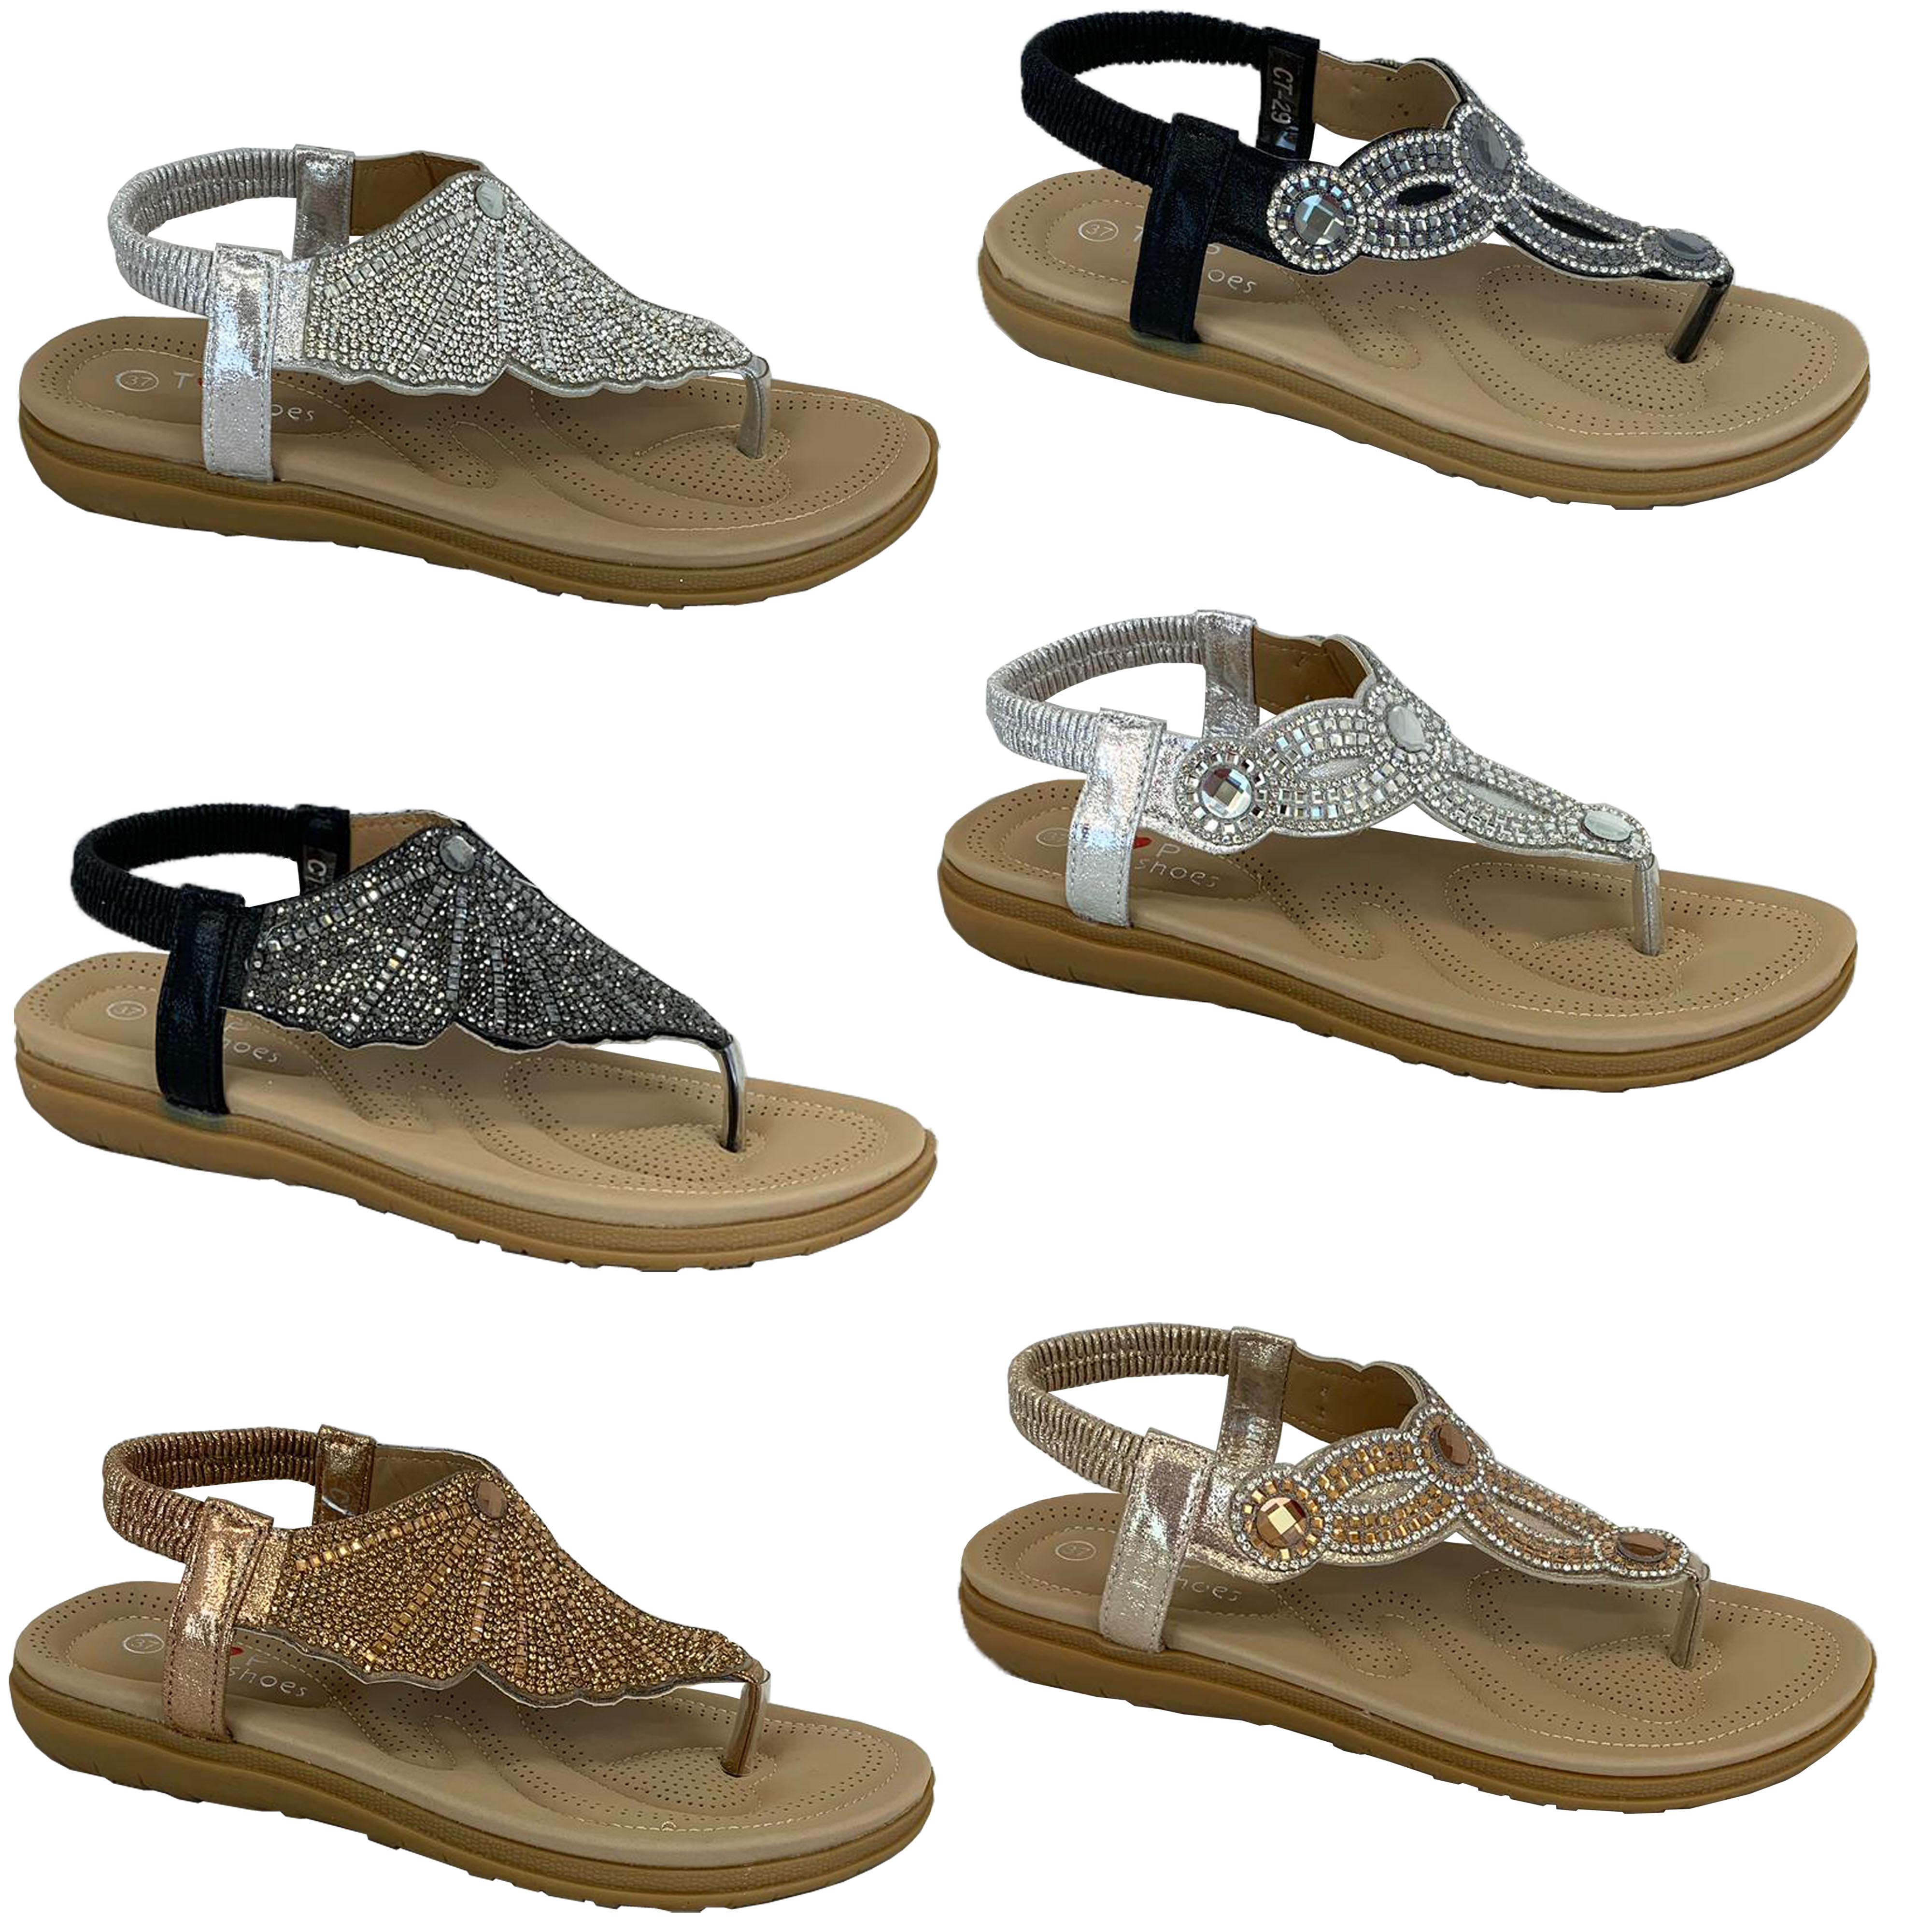 Ladies-Flat-Sandals-Womens-Diamante-Sling-Back-Toe-Post-Shoes-Summer-Fashion-New thumbnail 4